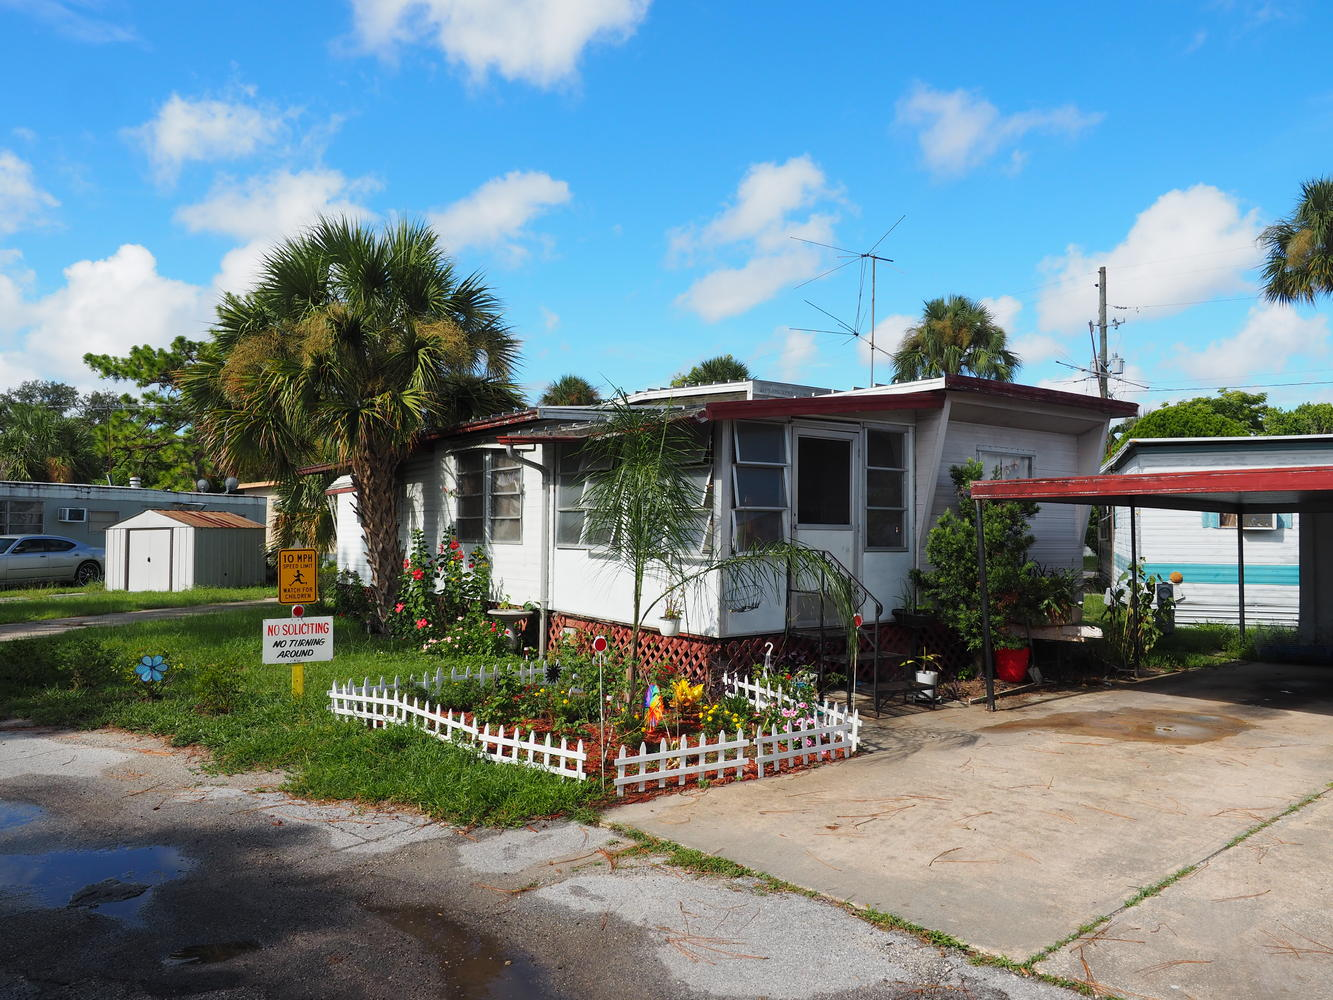 449 Acre Mobile Home Park